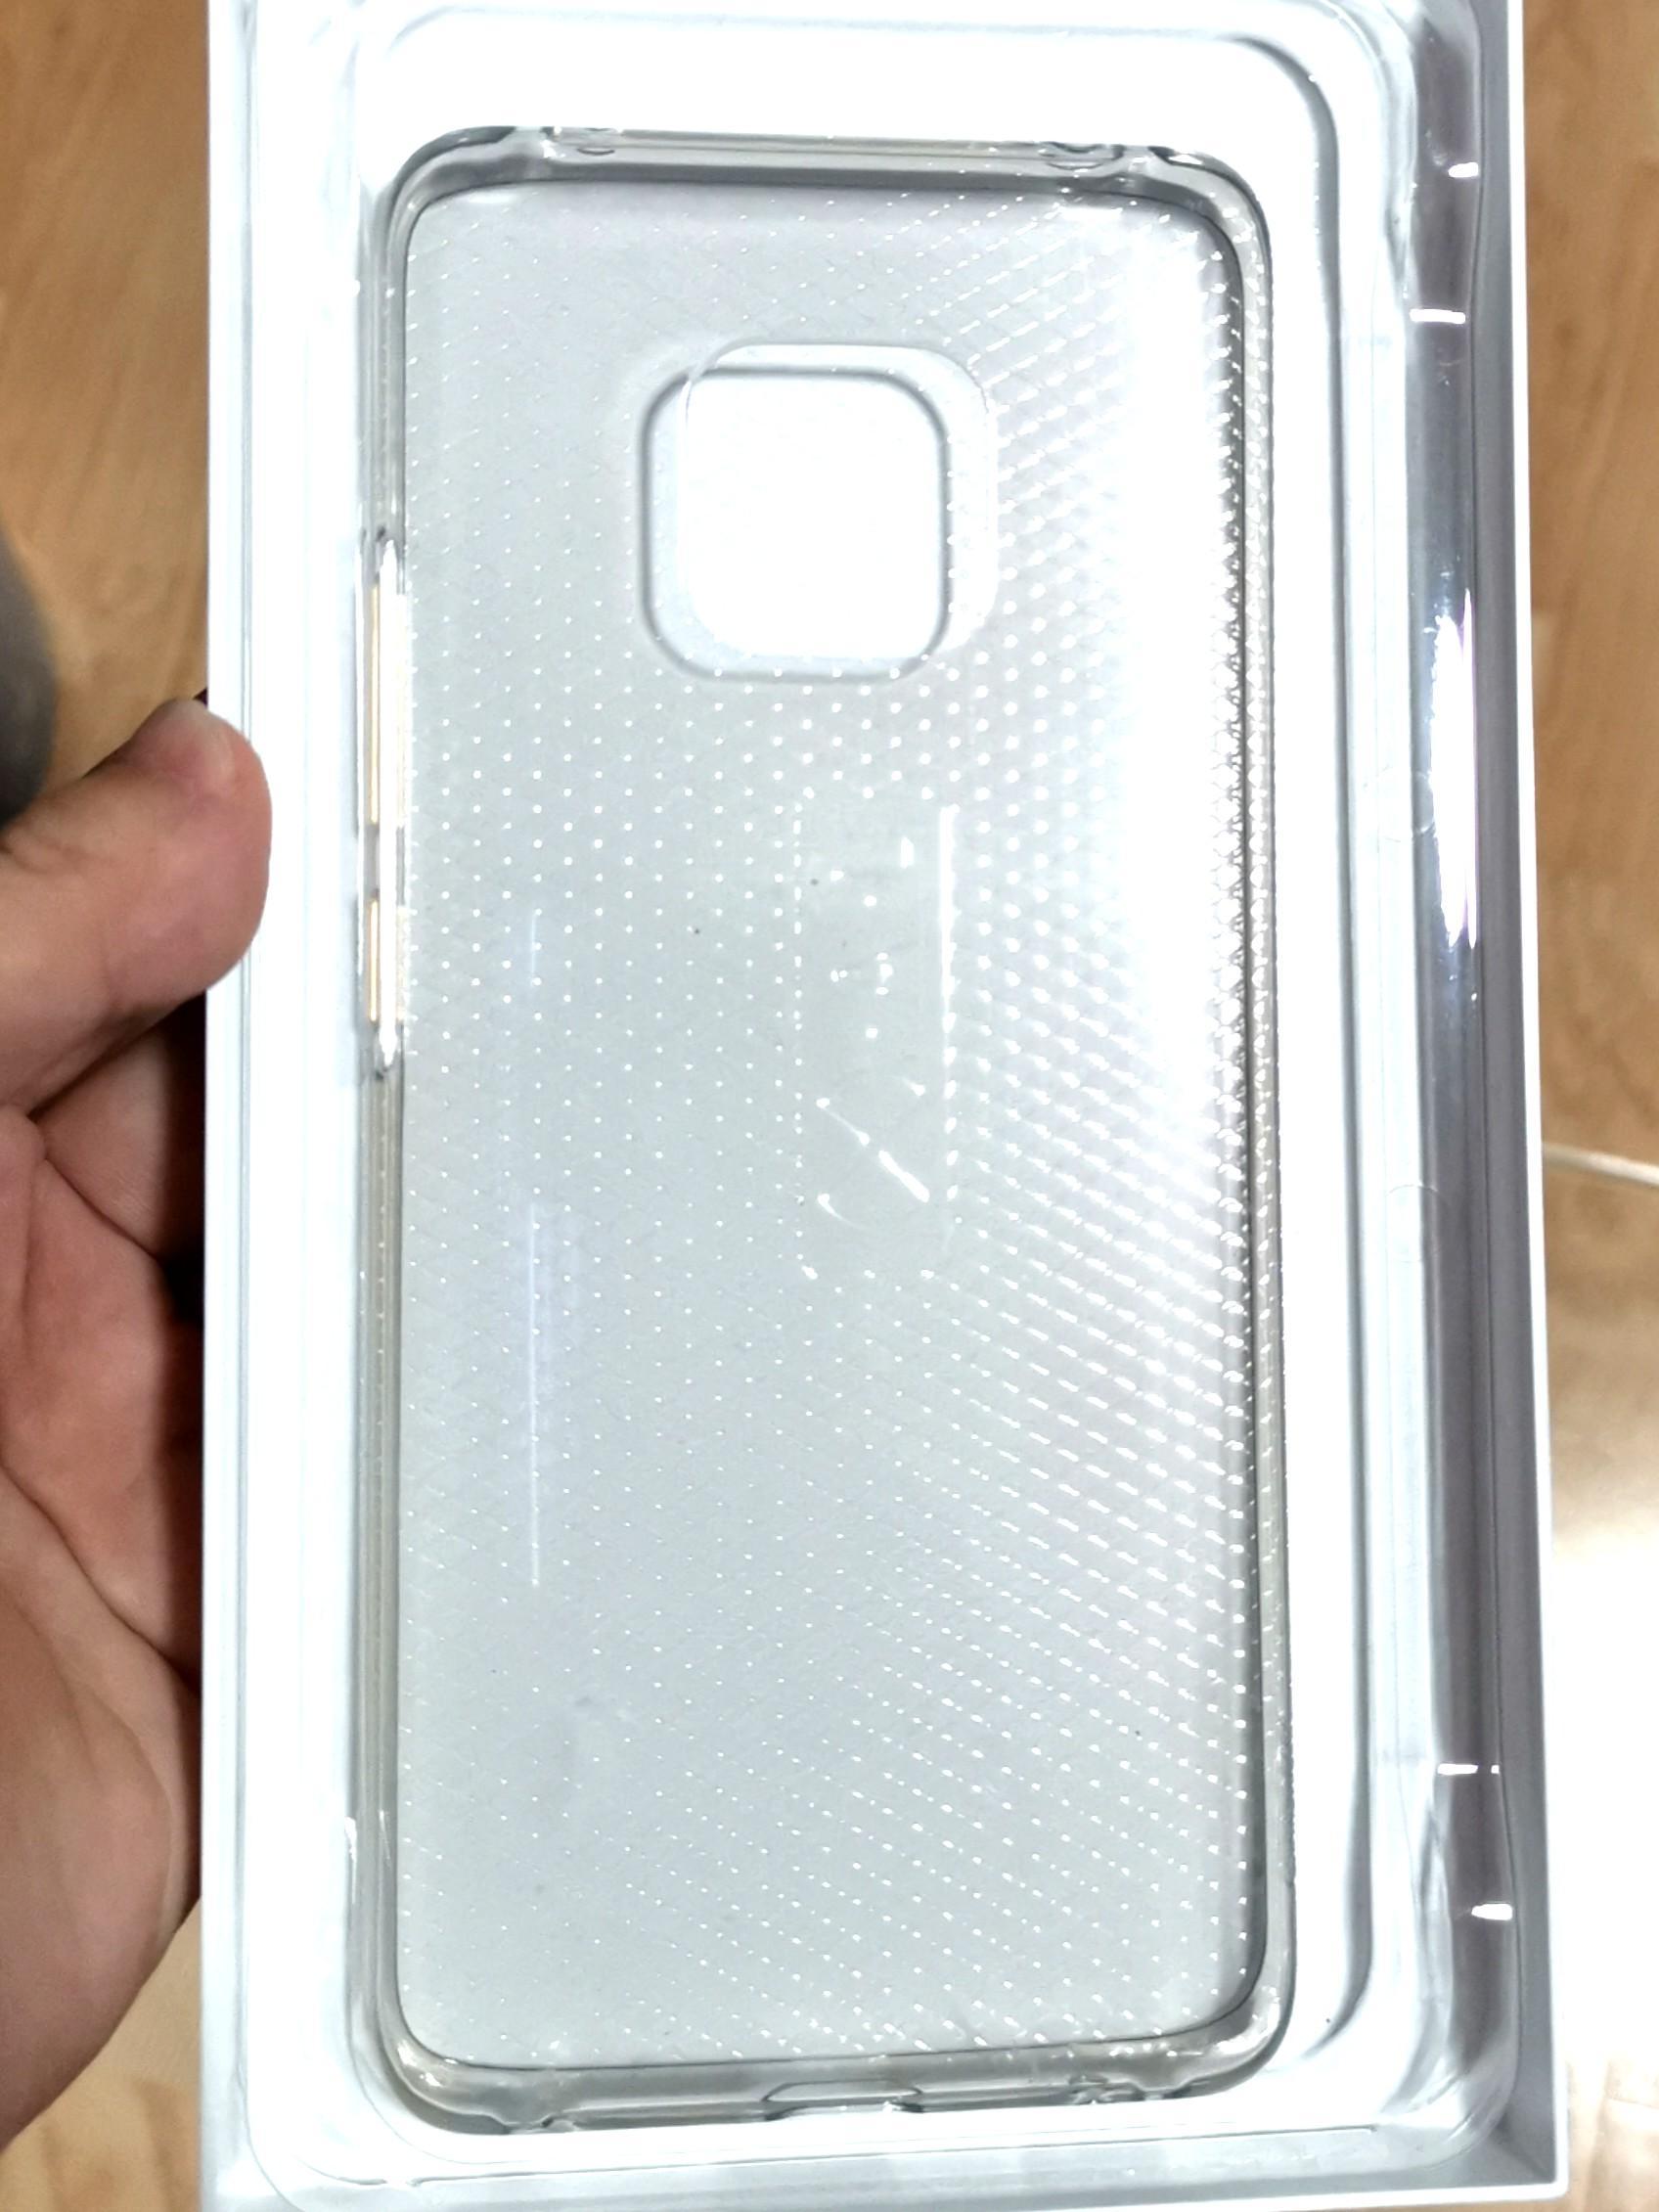 Huawei Mate 20 Pro transparent case